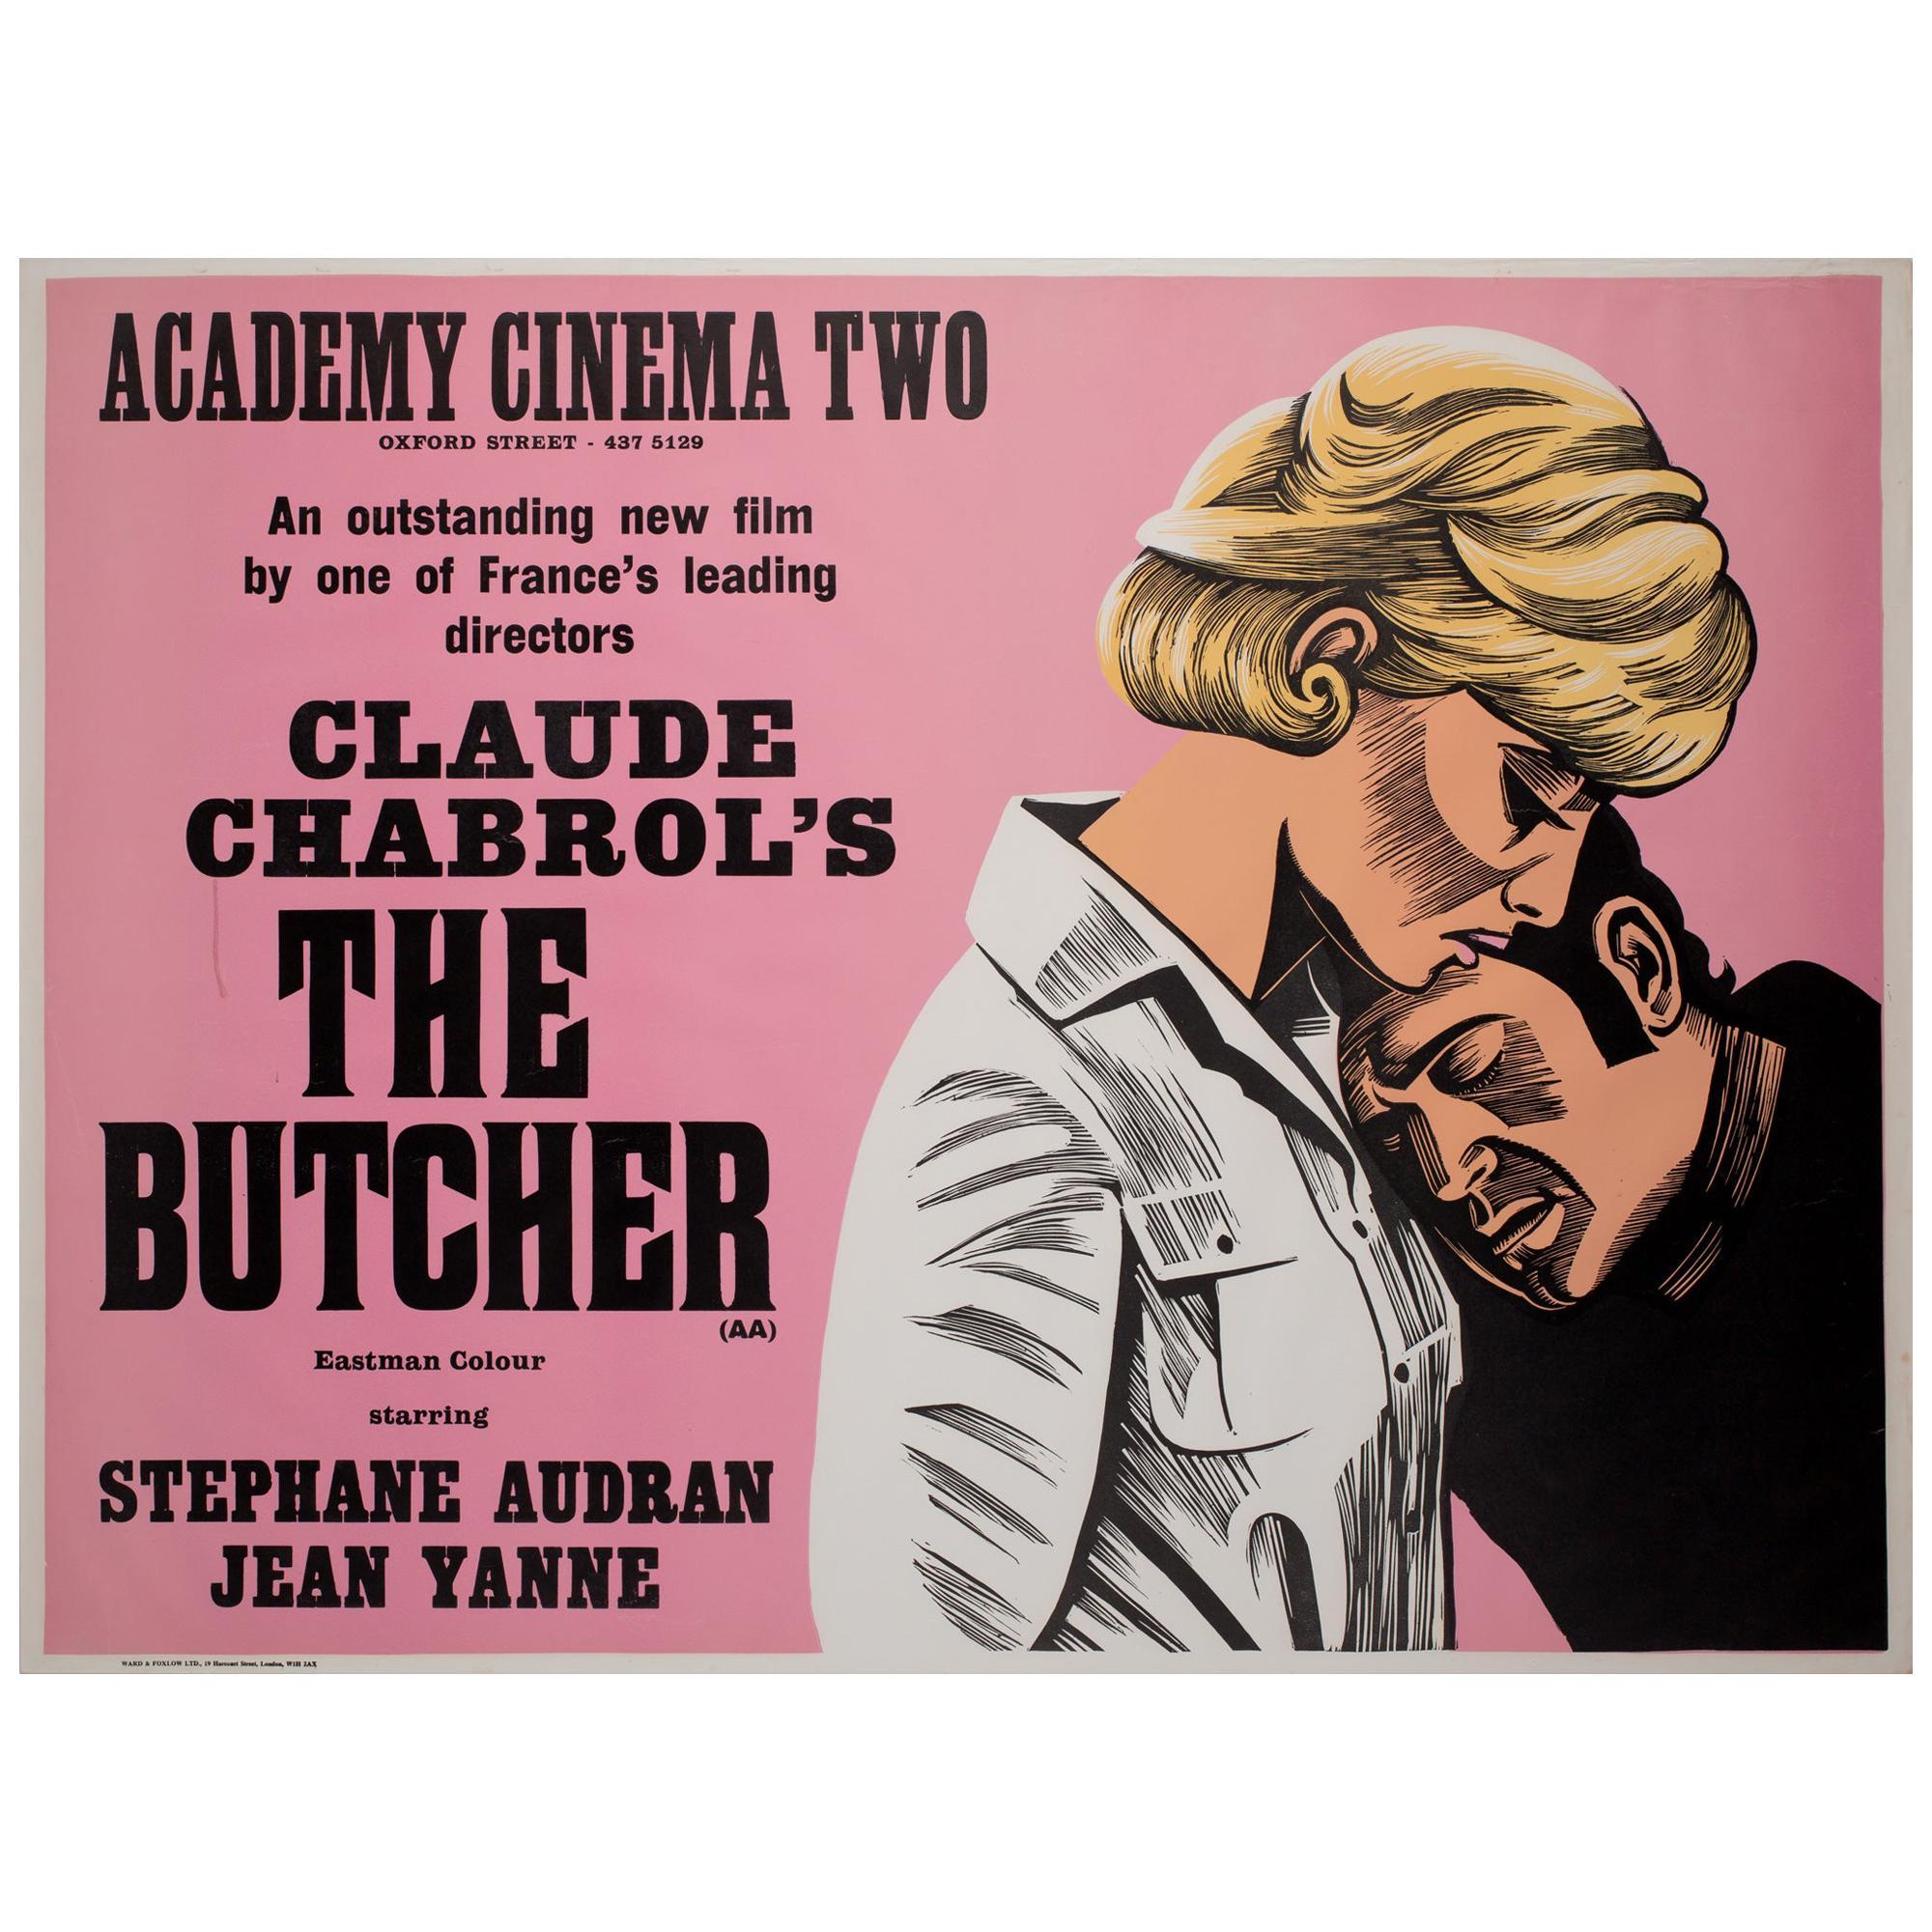 The Butcher 1972 Academy Cinema London UK Quad Film Poster, Strausfeld